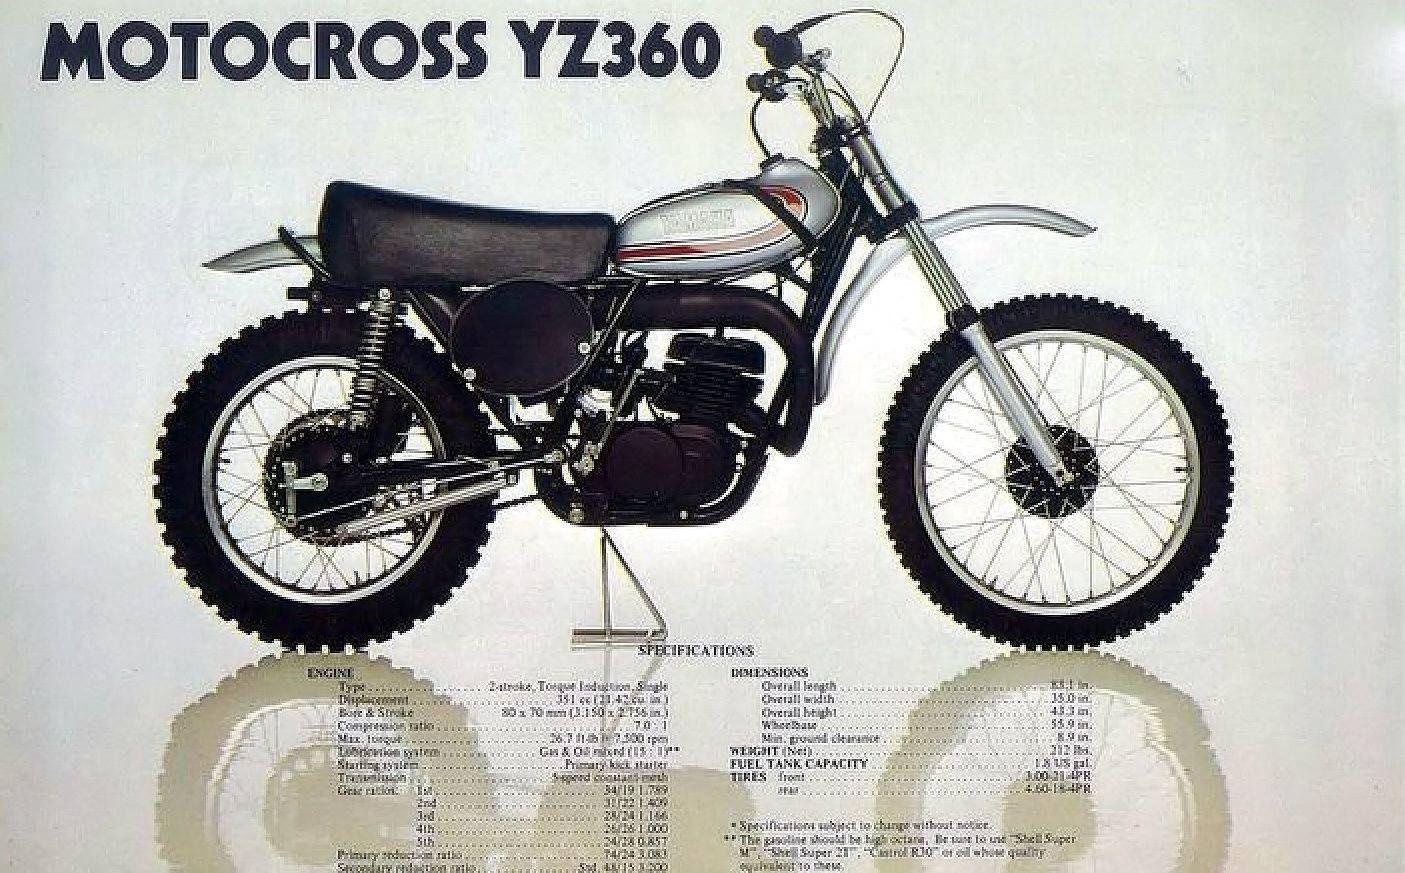 1974 Yamaha Mx 250 Wiring Schematic   schematic and wiring ...